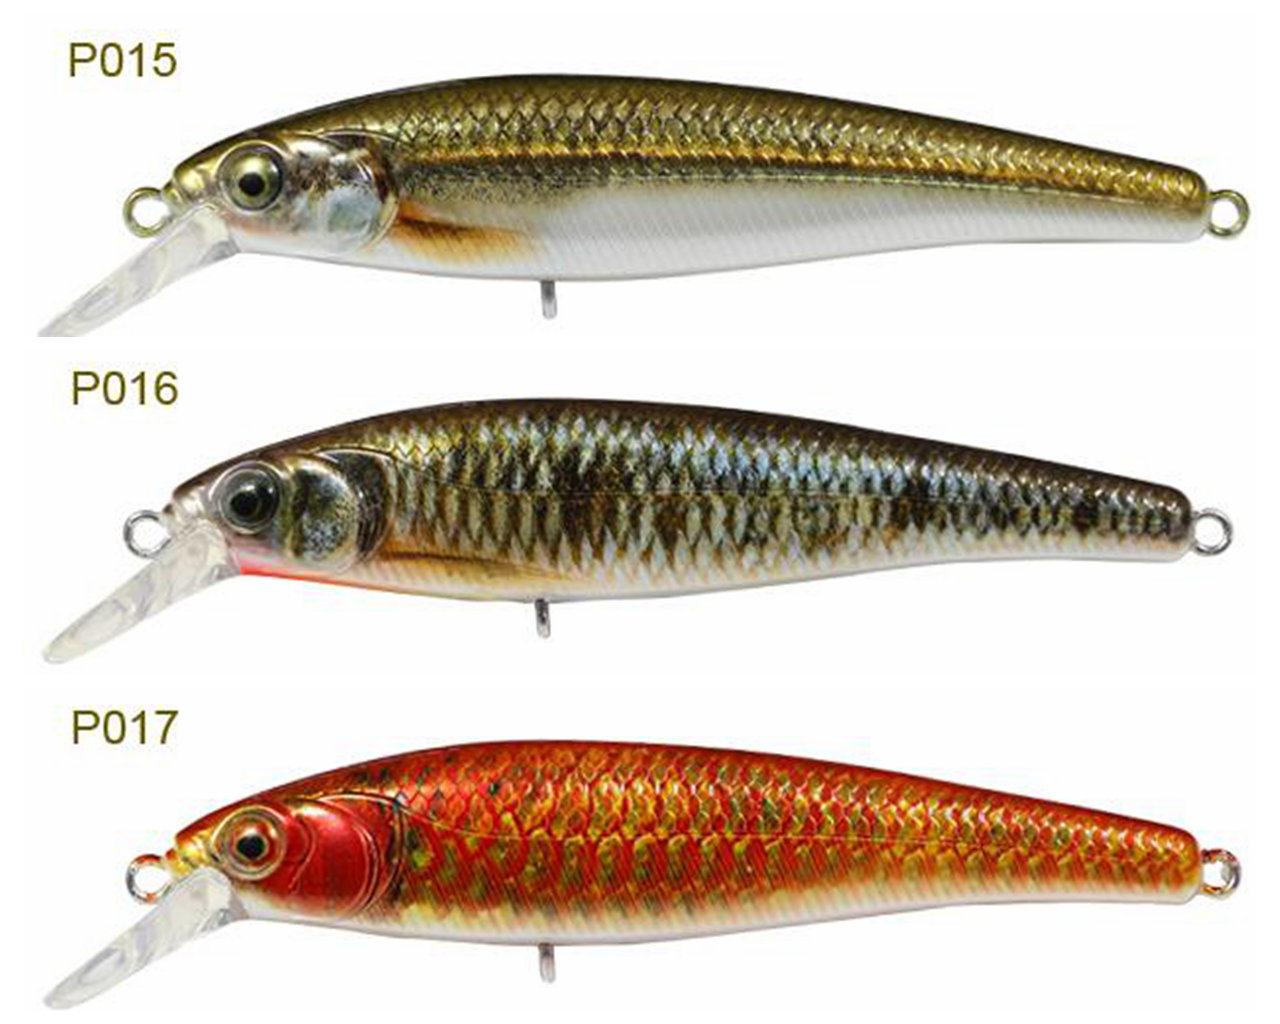 Jerk Bait-Hard Fishing Lure-Fishing Bait-Fishing Tackles-Bright Jerk Lure